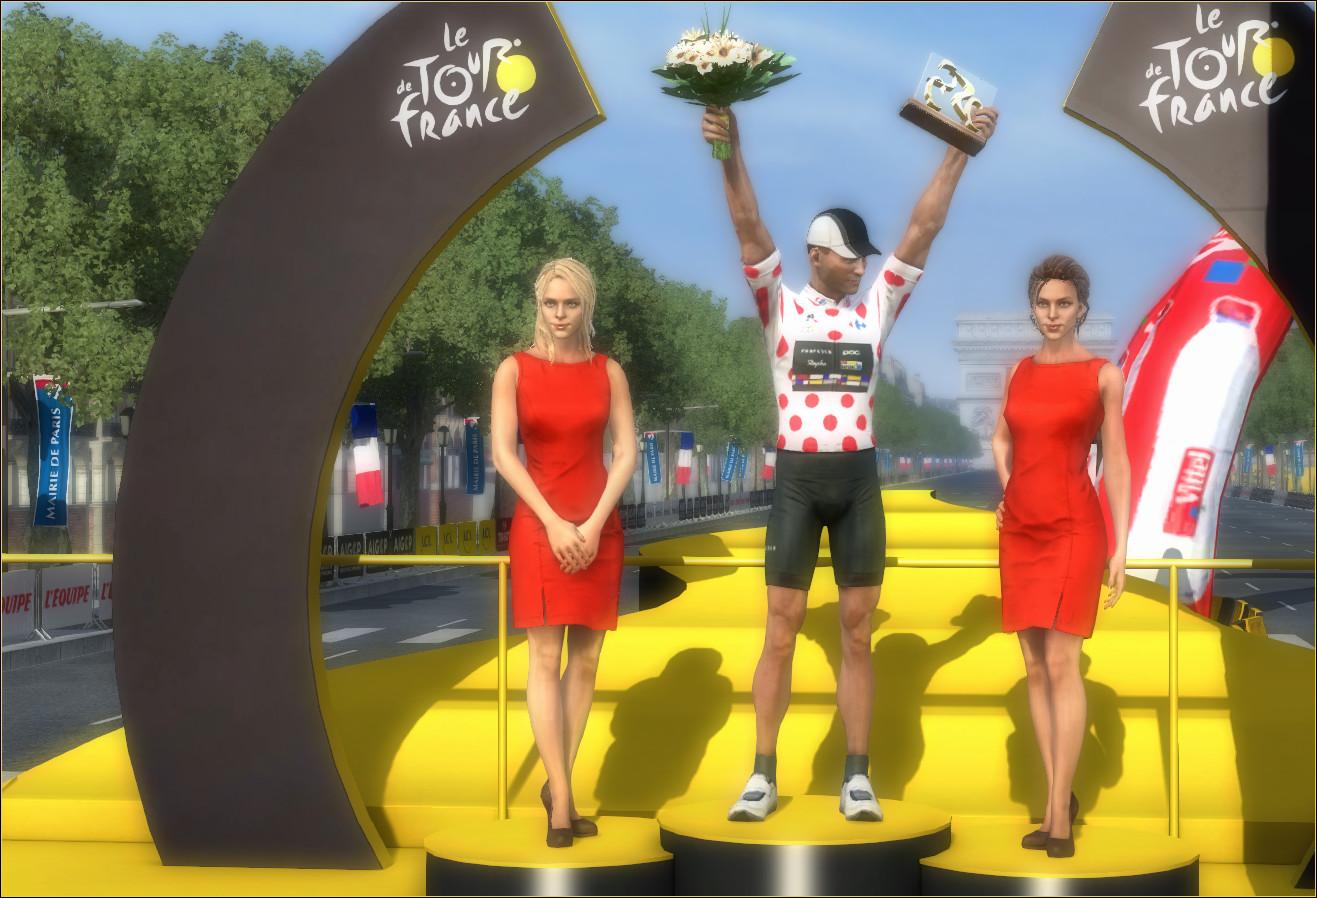 pcmdaily.com/images/mg/2019/Races/GTM/Tour/S21/51.jpg